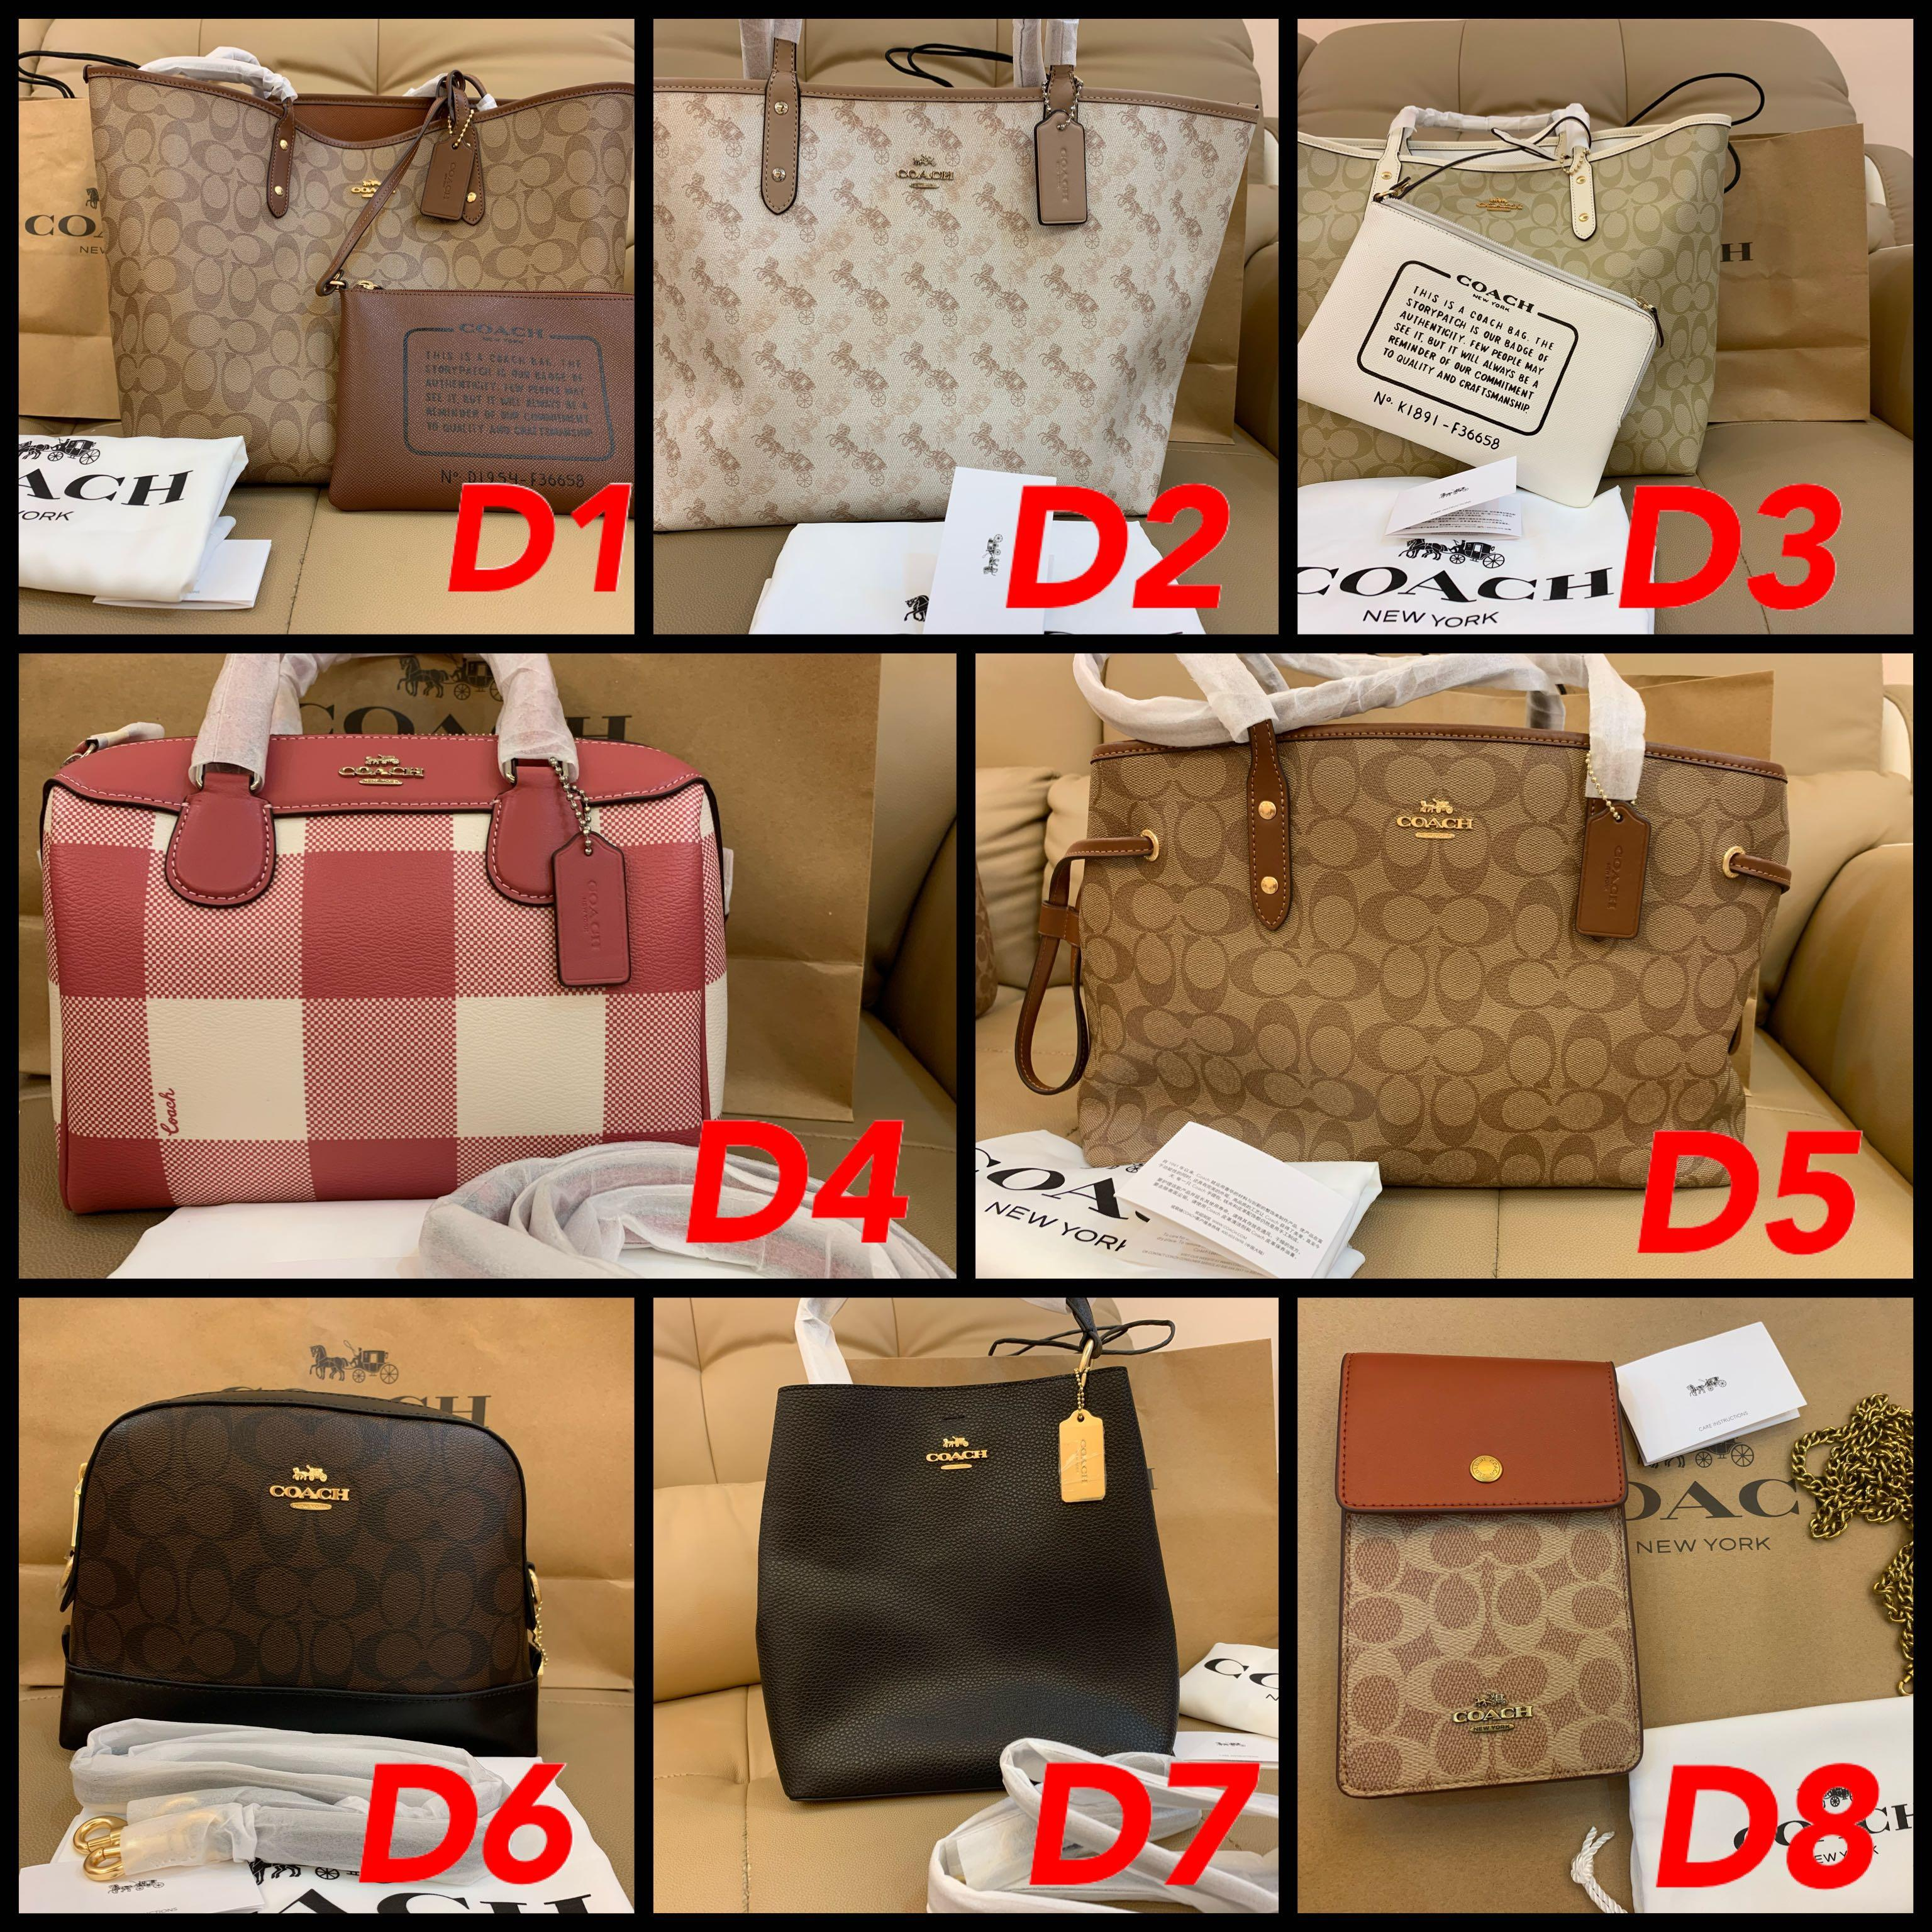 (20/06/20)Ready Stock authentic coach women bag wallet purse  sling bag Tory Burch backpac belt bag woc permanent listingggbfgvvbbbbbbb